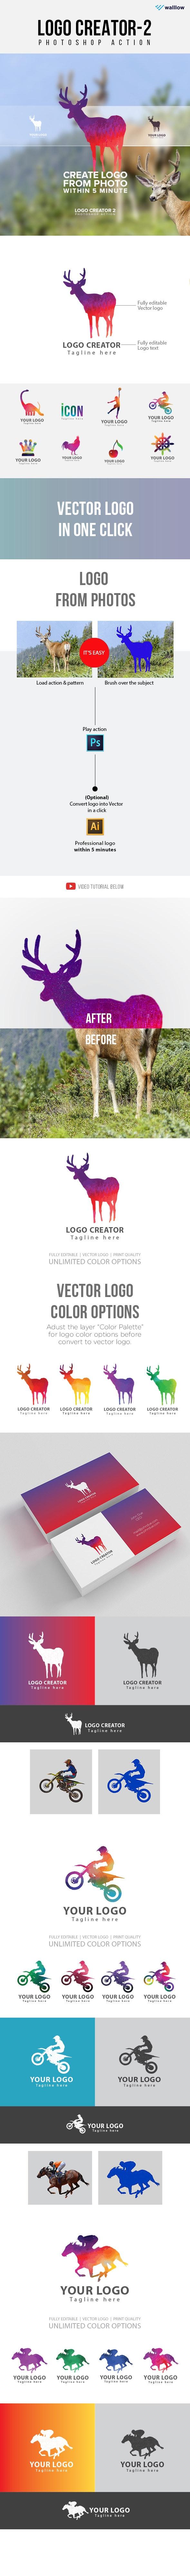 Logo Creator 2 Photoshop Action - Actions Photoshop